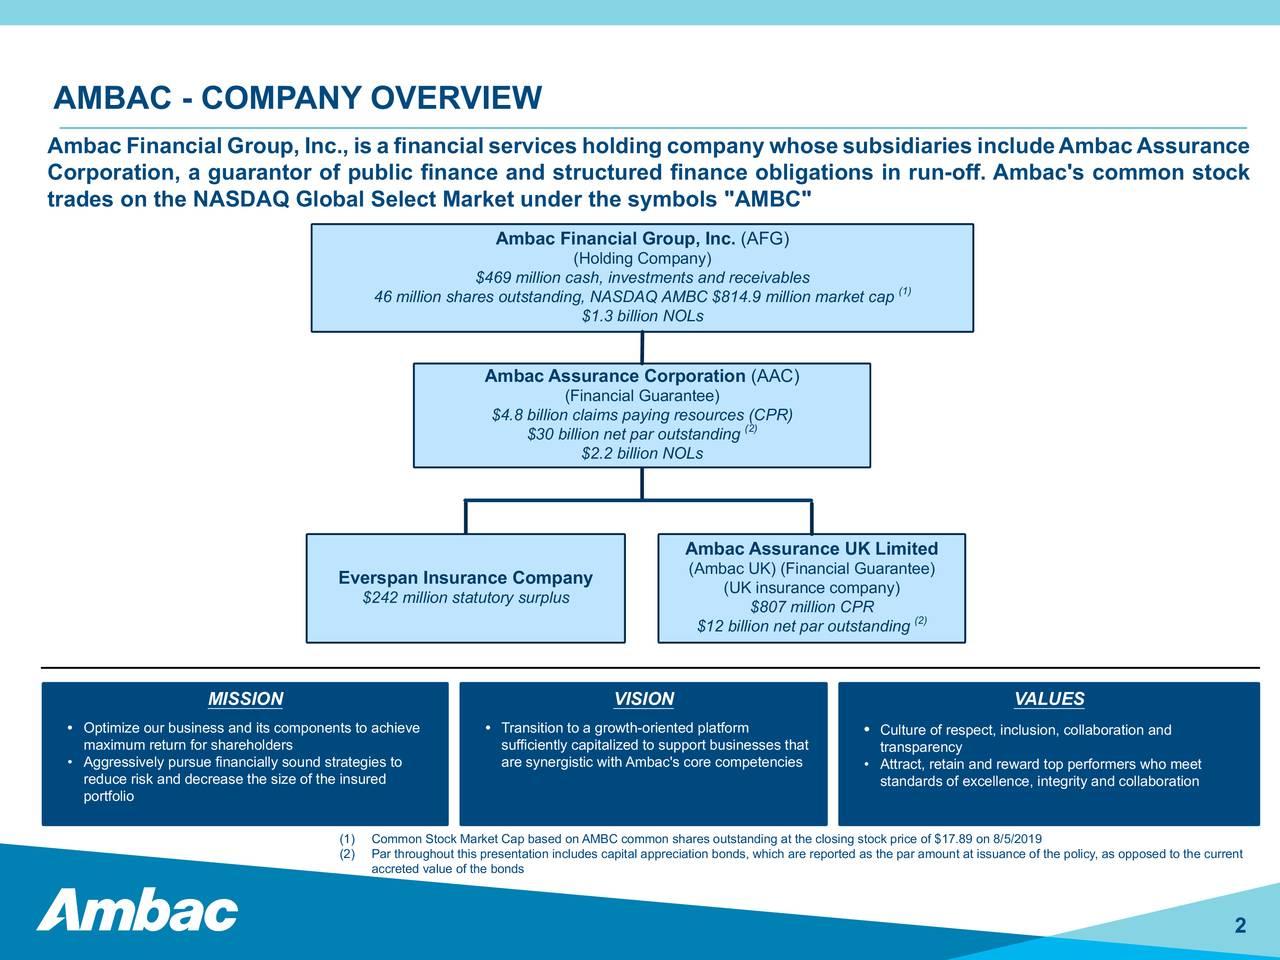 AMBAC - COMPANY OVERVIEW